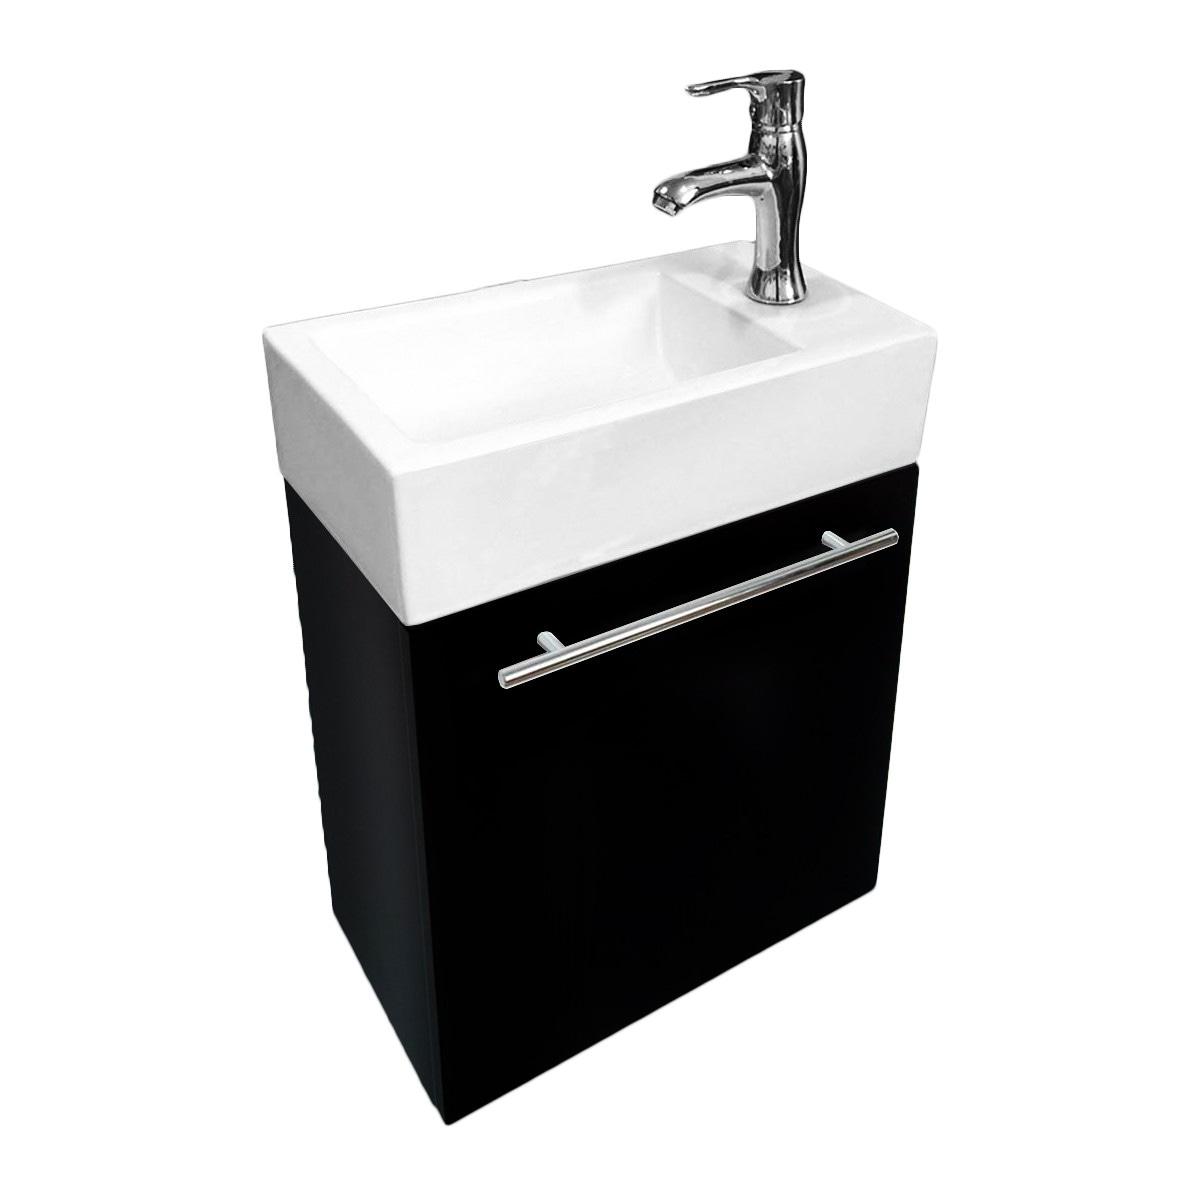 Shop Renovators Supply Small Wall Mount Bathroom Vanity Cabinet